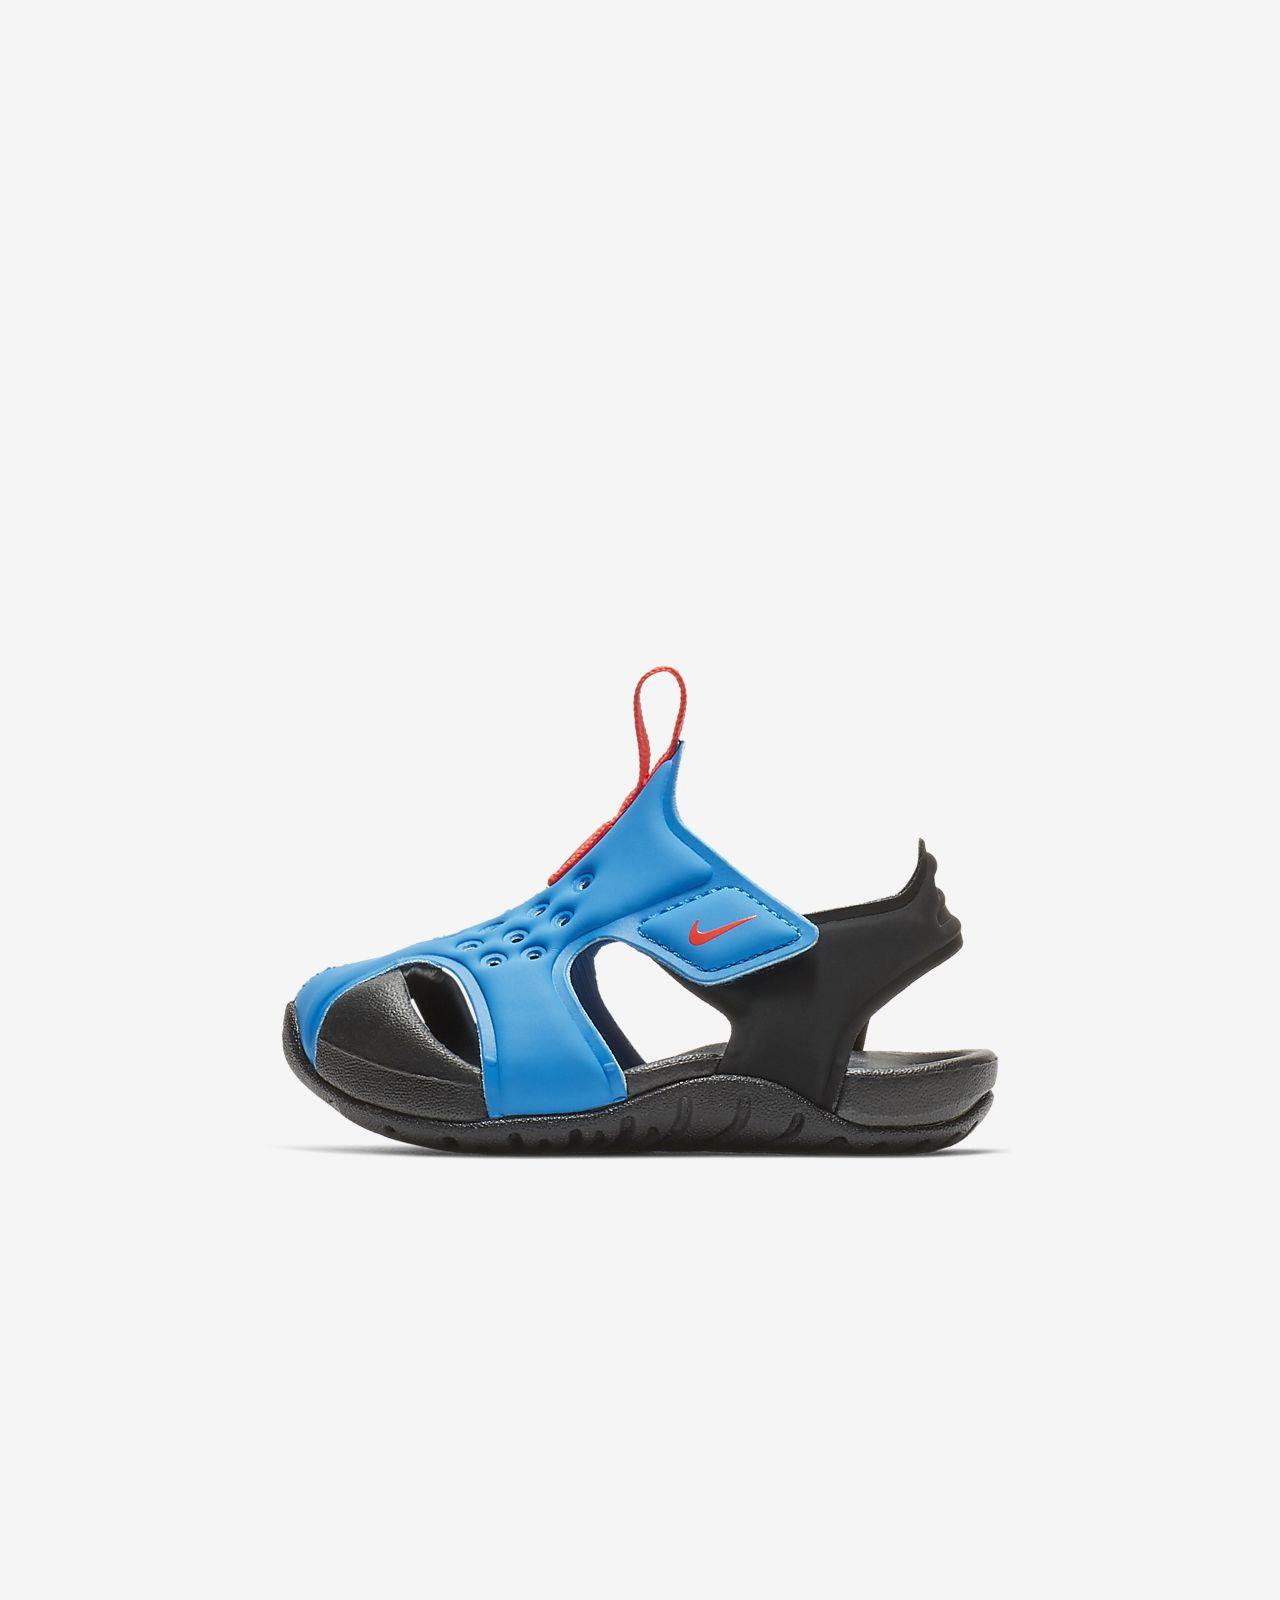 Pkn0wo 2 Piccolich Protect Nike Neonatibimbi Sunray Sandalo PnN8X0wOk